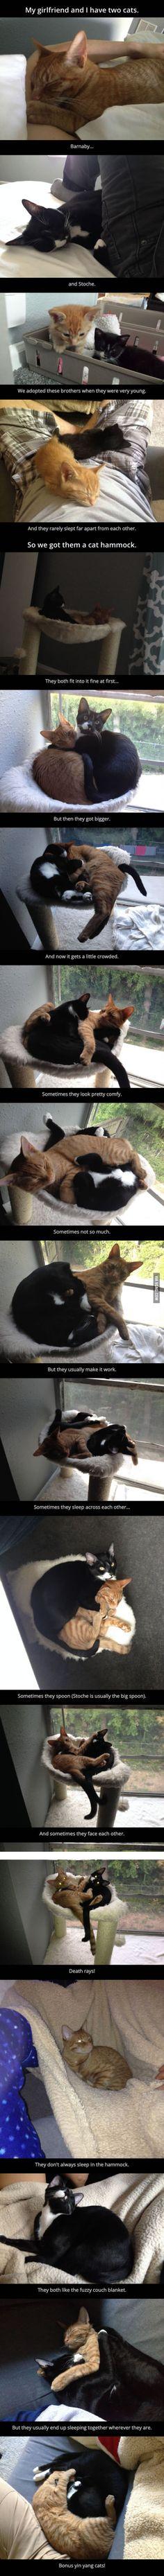 2 gatos, 1 cama ...